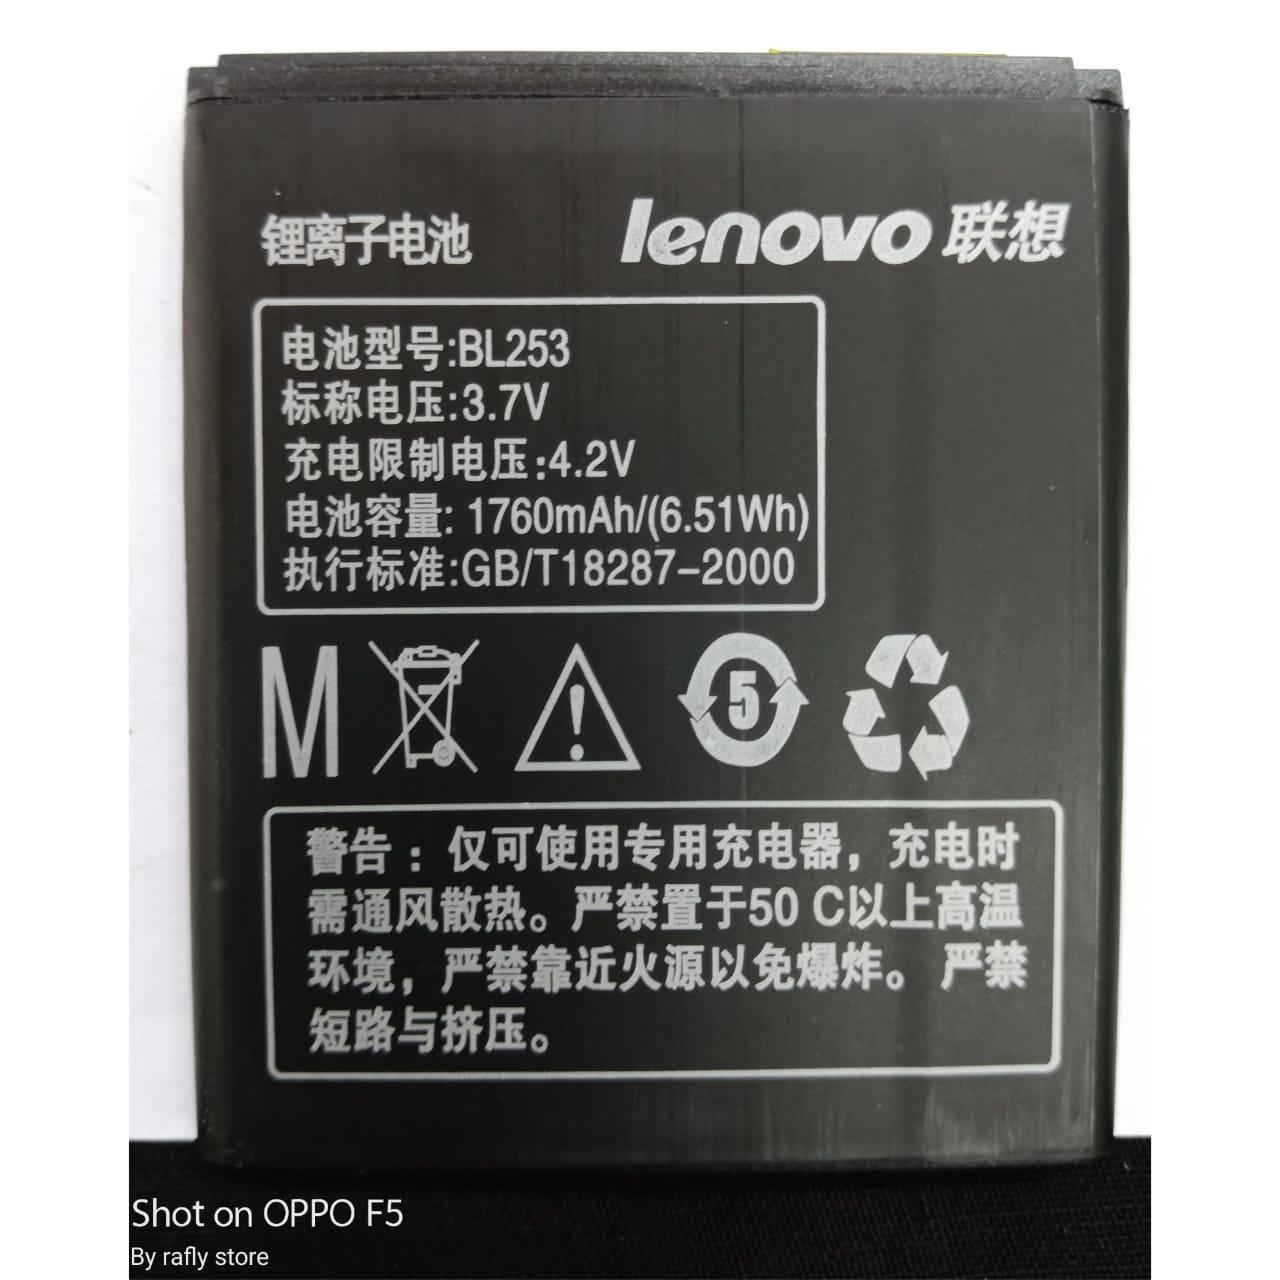 A/R; Batrai Handphone Baterai Lenovo BL253 Baterai Lenovo A1000 A1000M A2010 Battery For Lenovo BL2